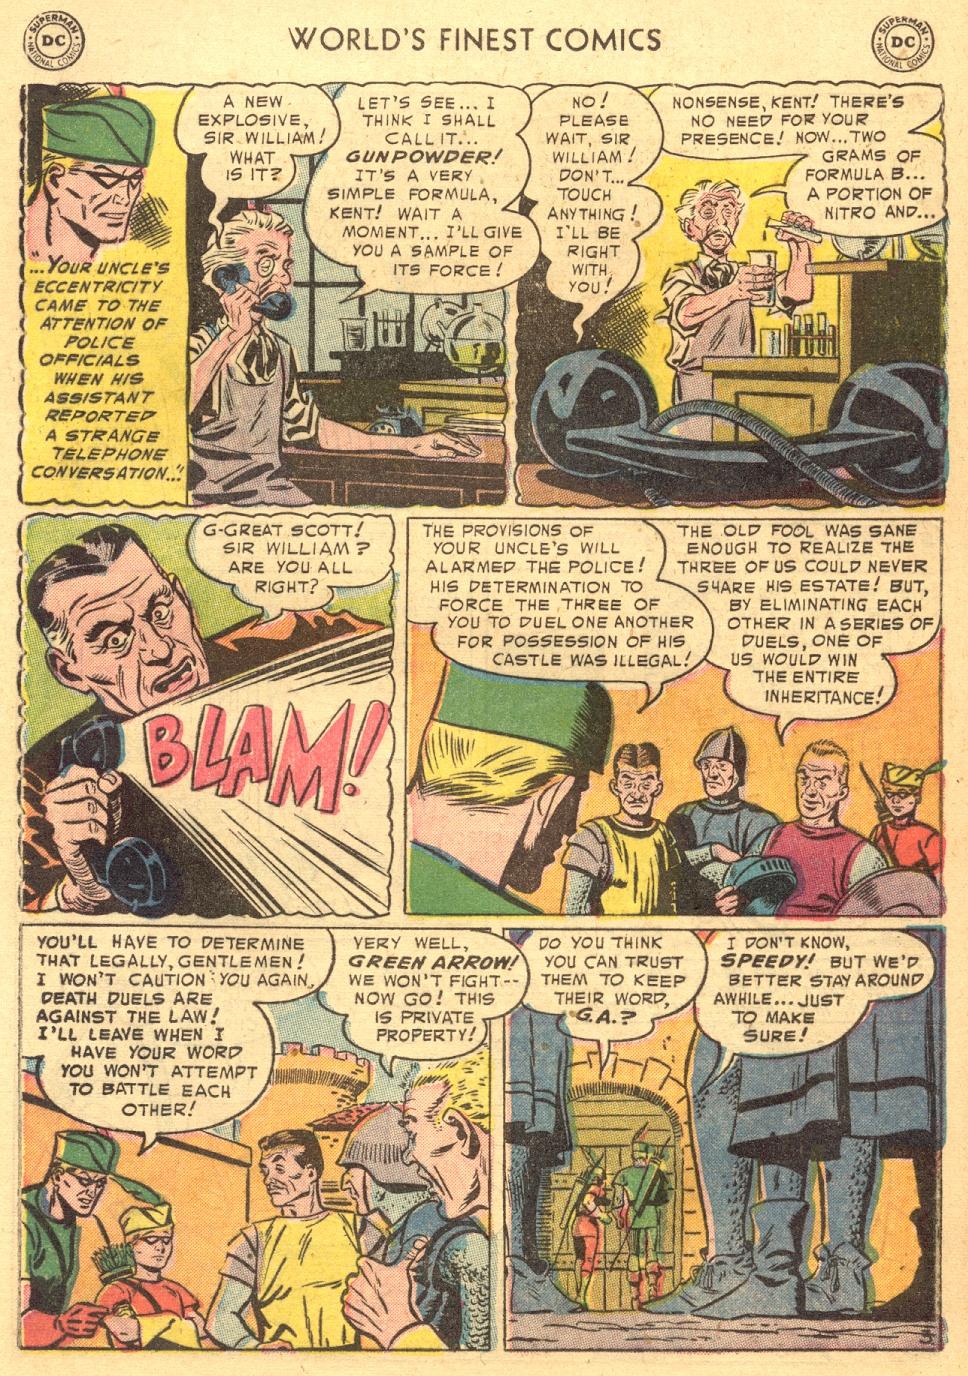 Read online World's Finest Comics comic -  Issue #70 - 23